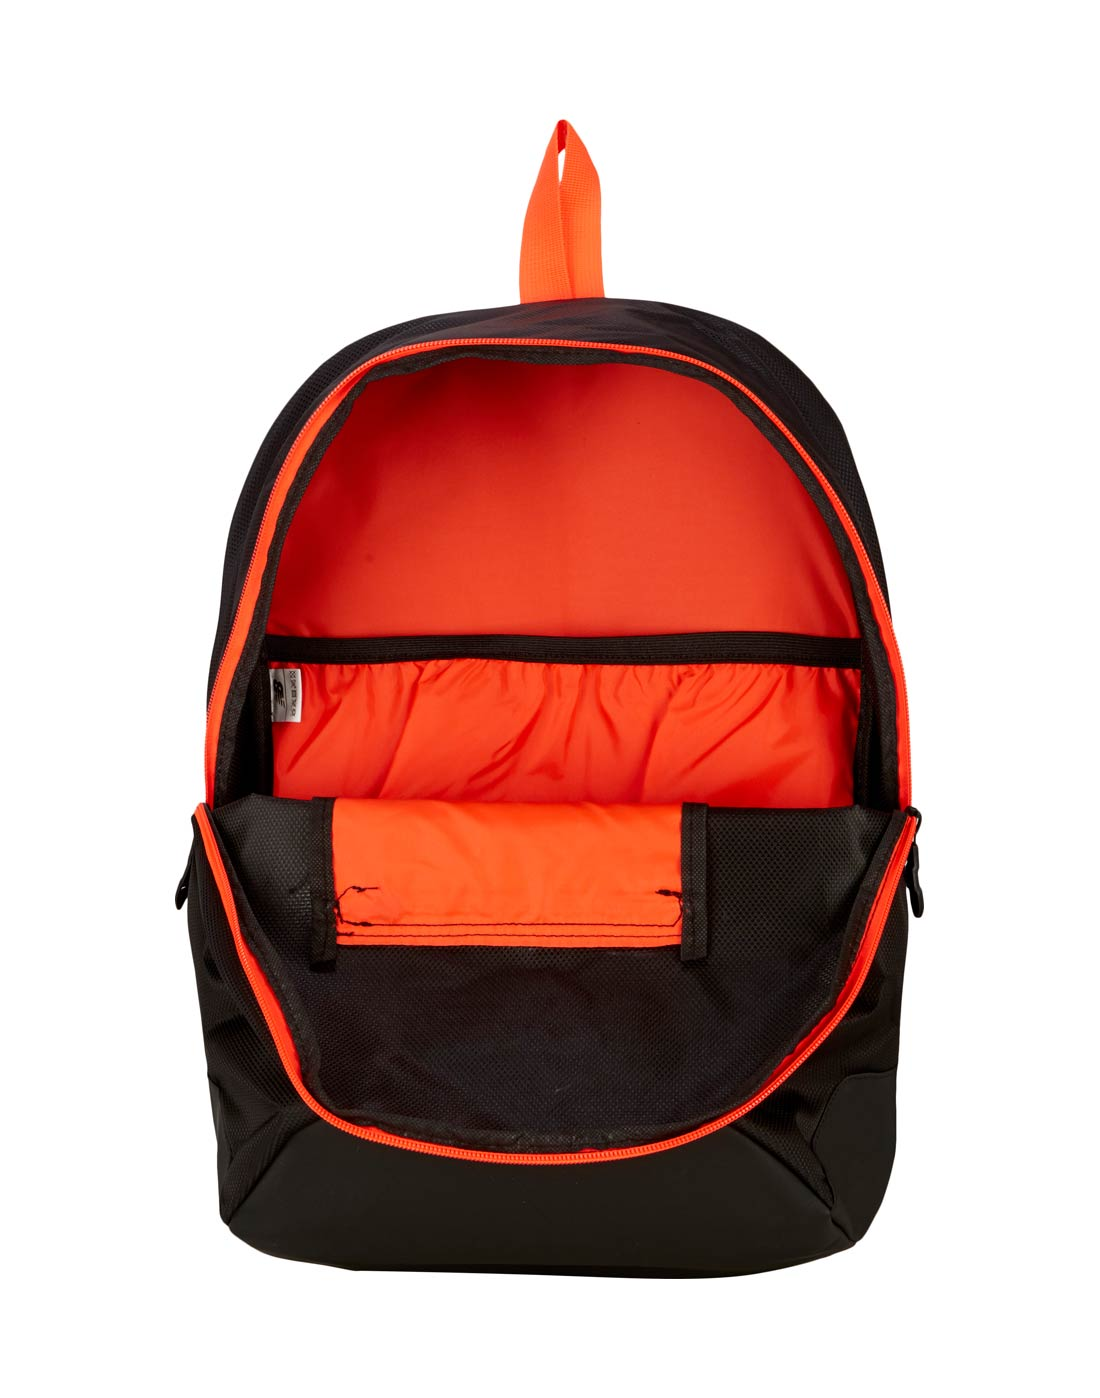 8129811e42ef Liverpool Backpack · Liverpool Backpack · Liverpool Backpack · Liverpool  Backpack